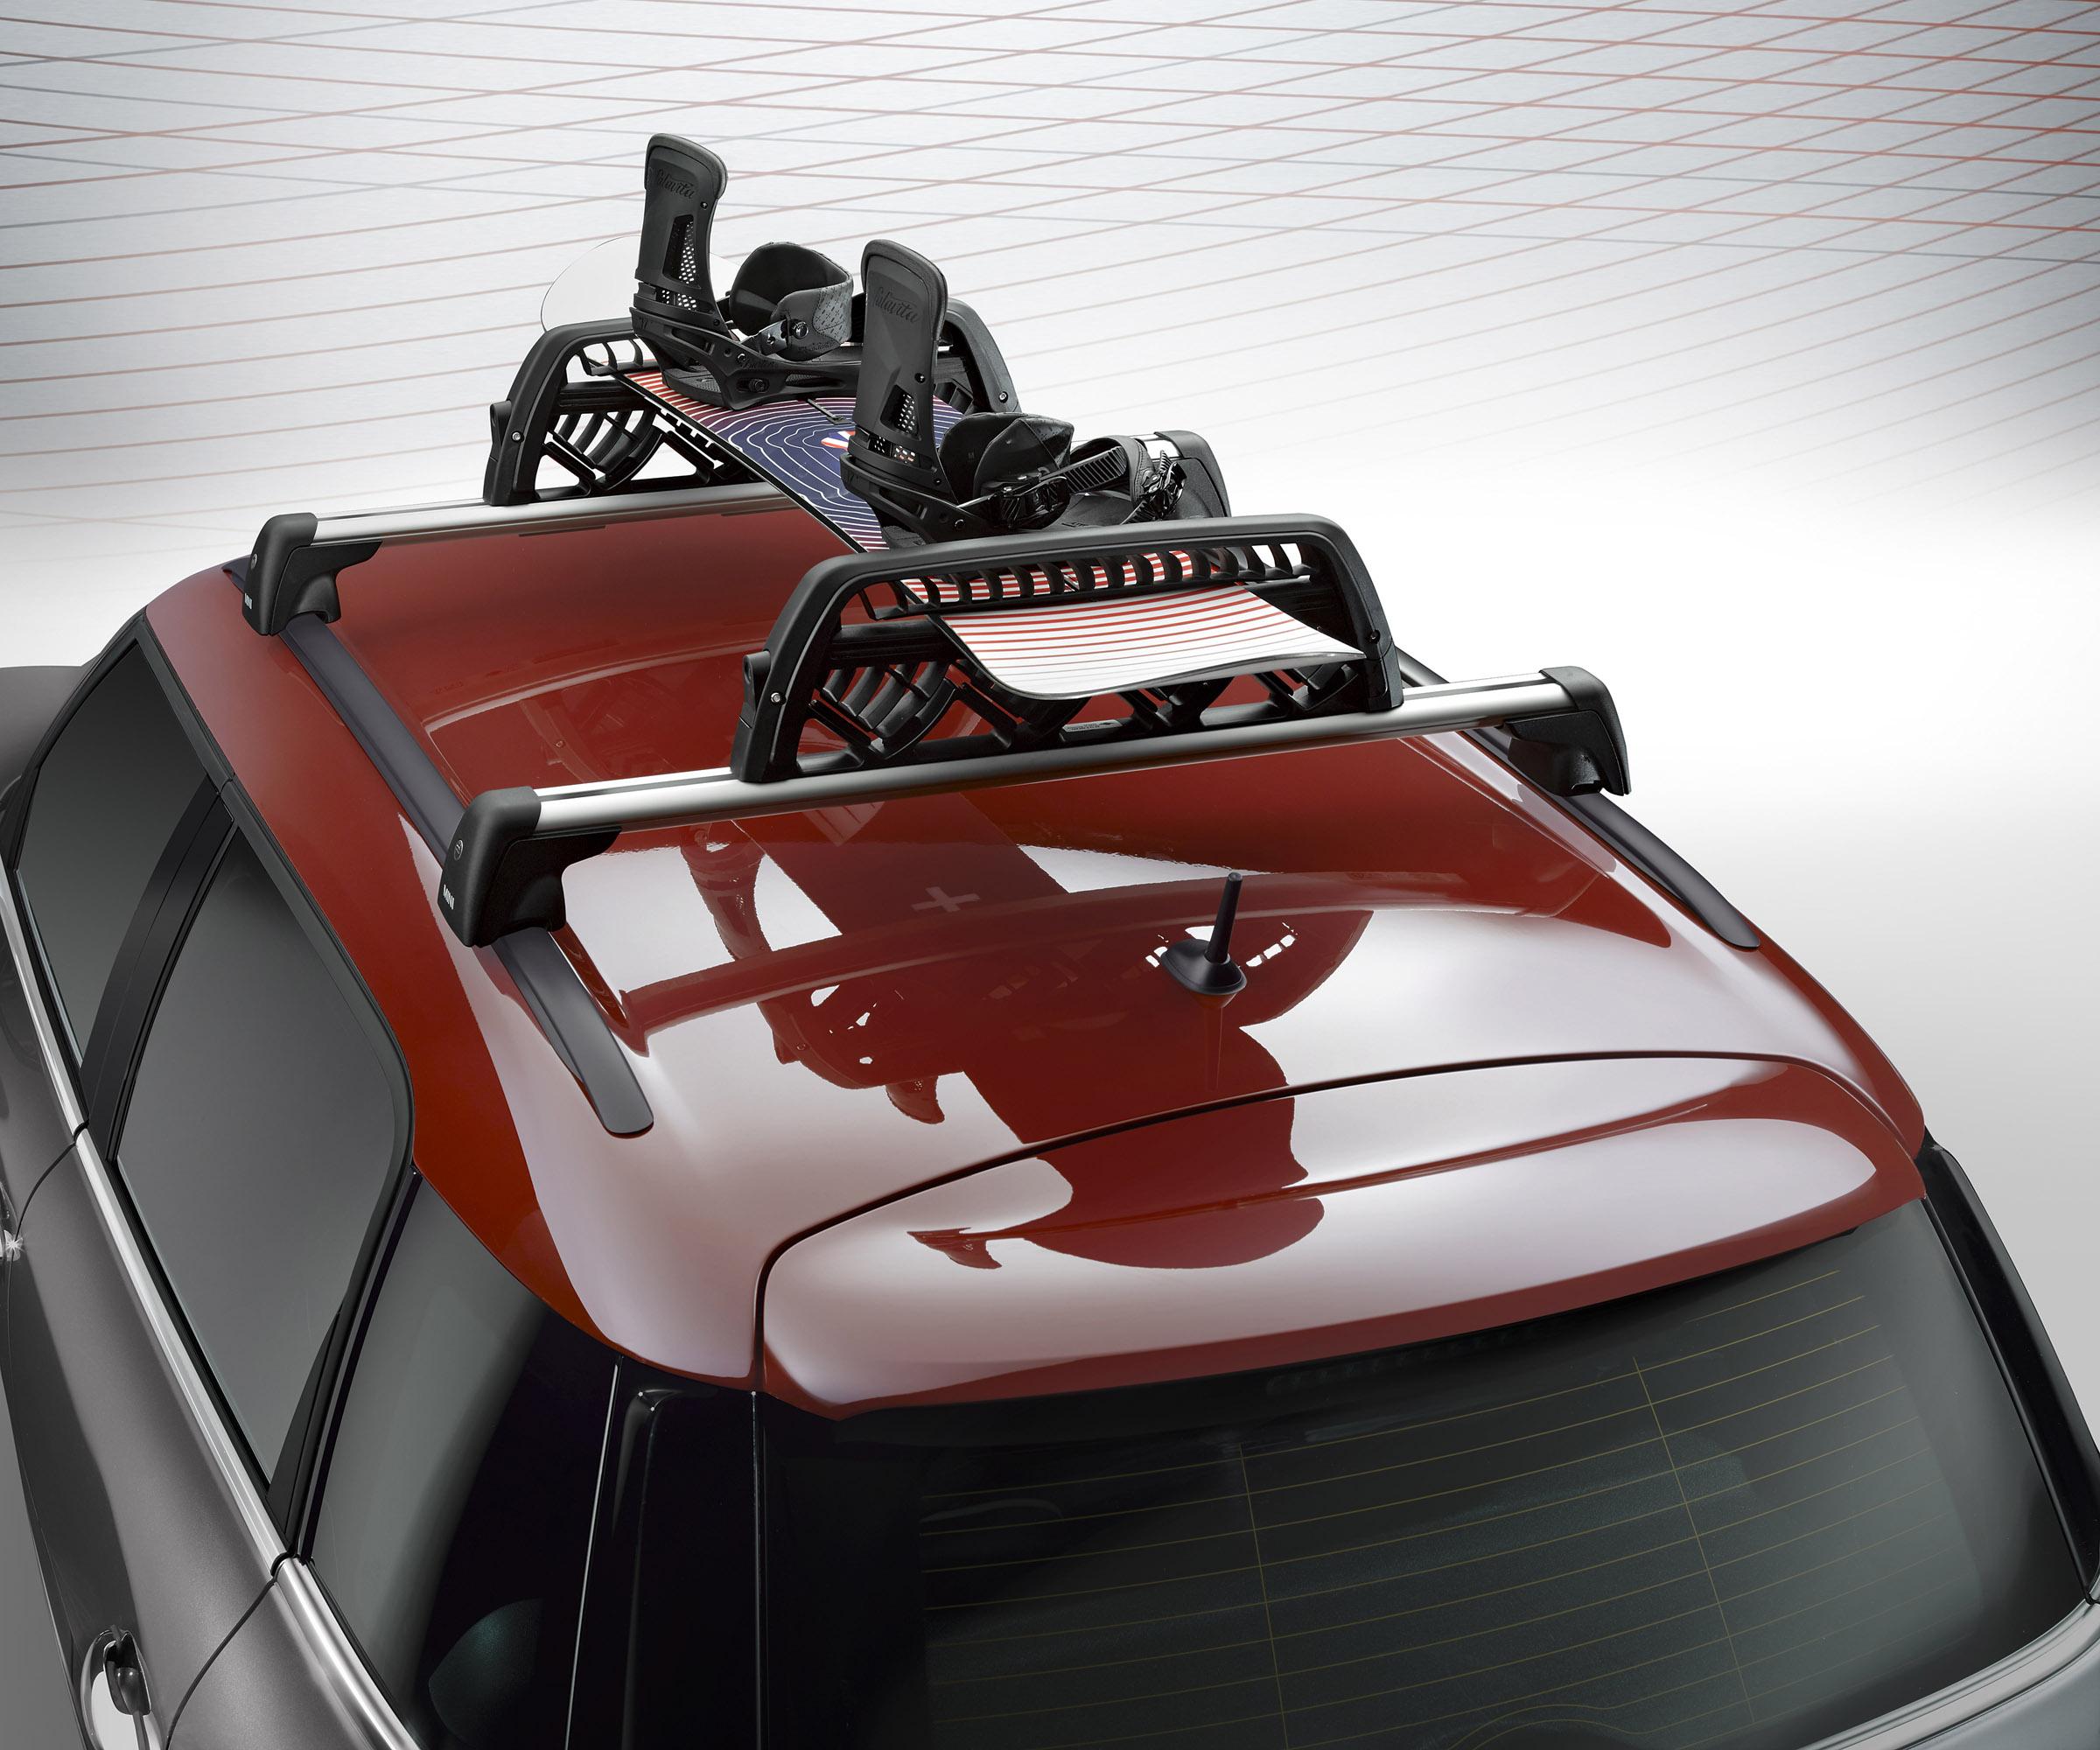 2015 Mini Countryman Suspension: HD Pictures @ Automobilesreview